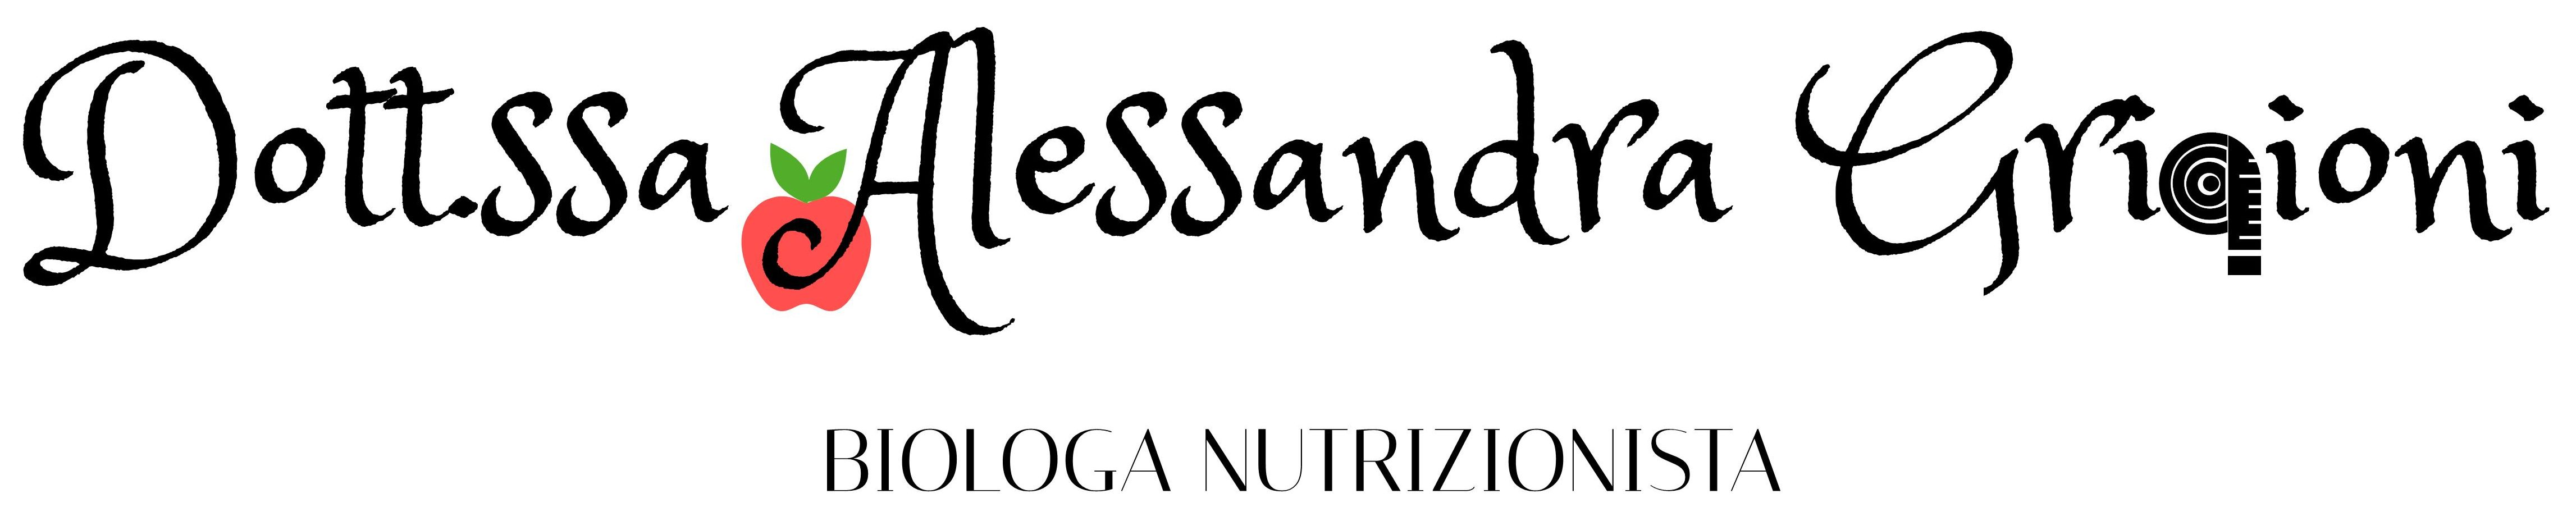 Dott.ssa Alessandra Grigioni